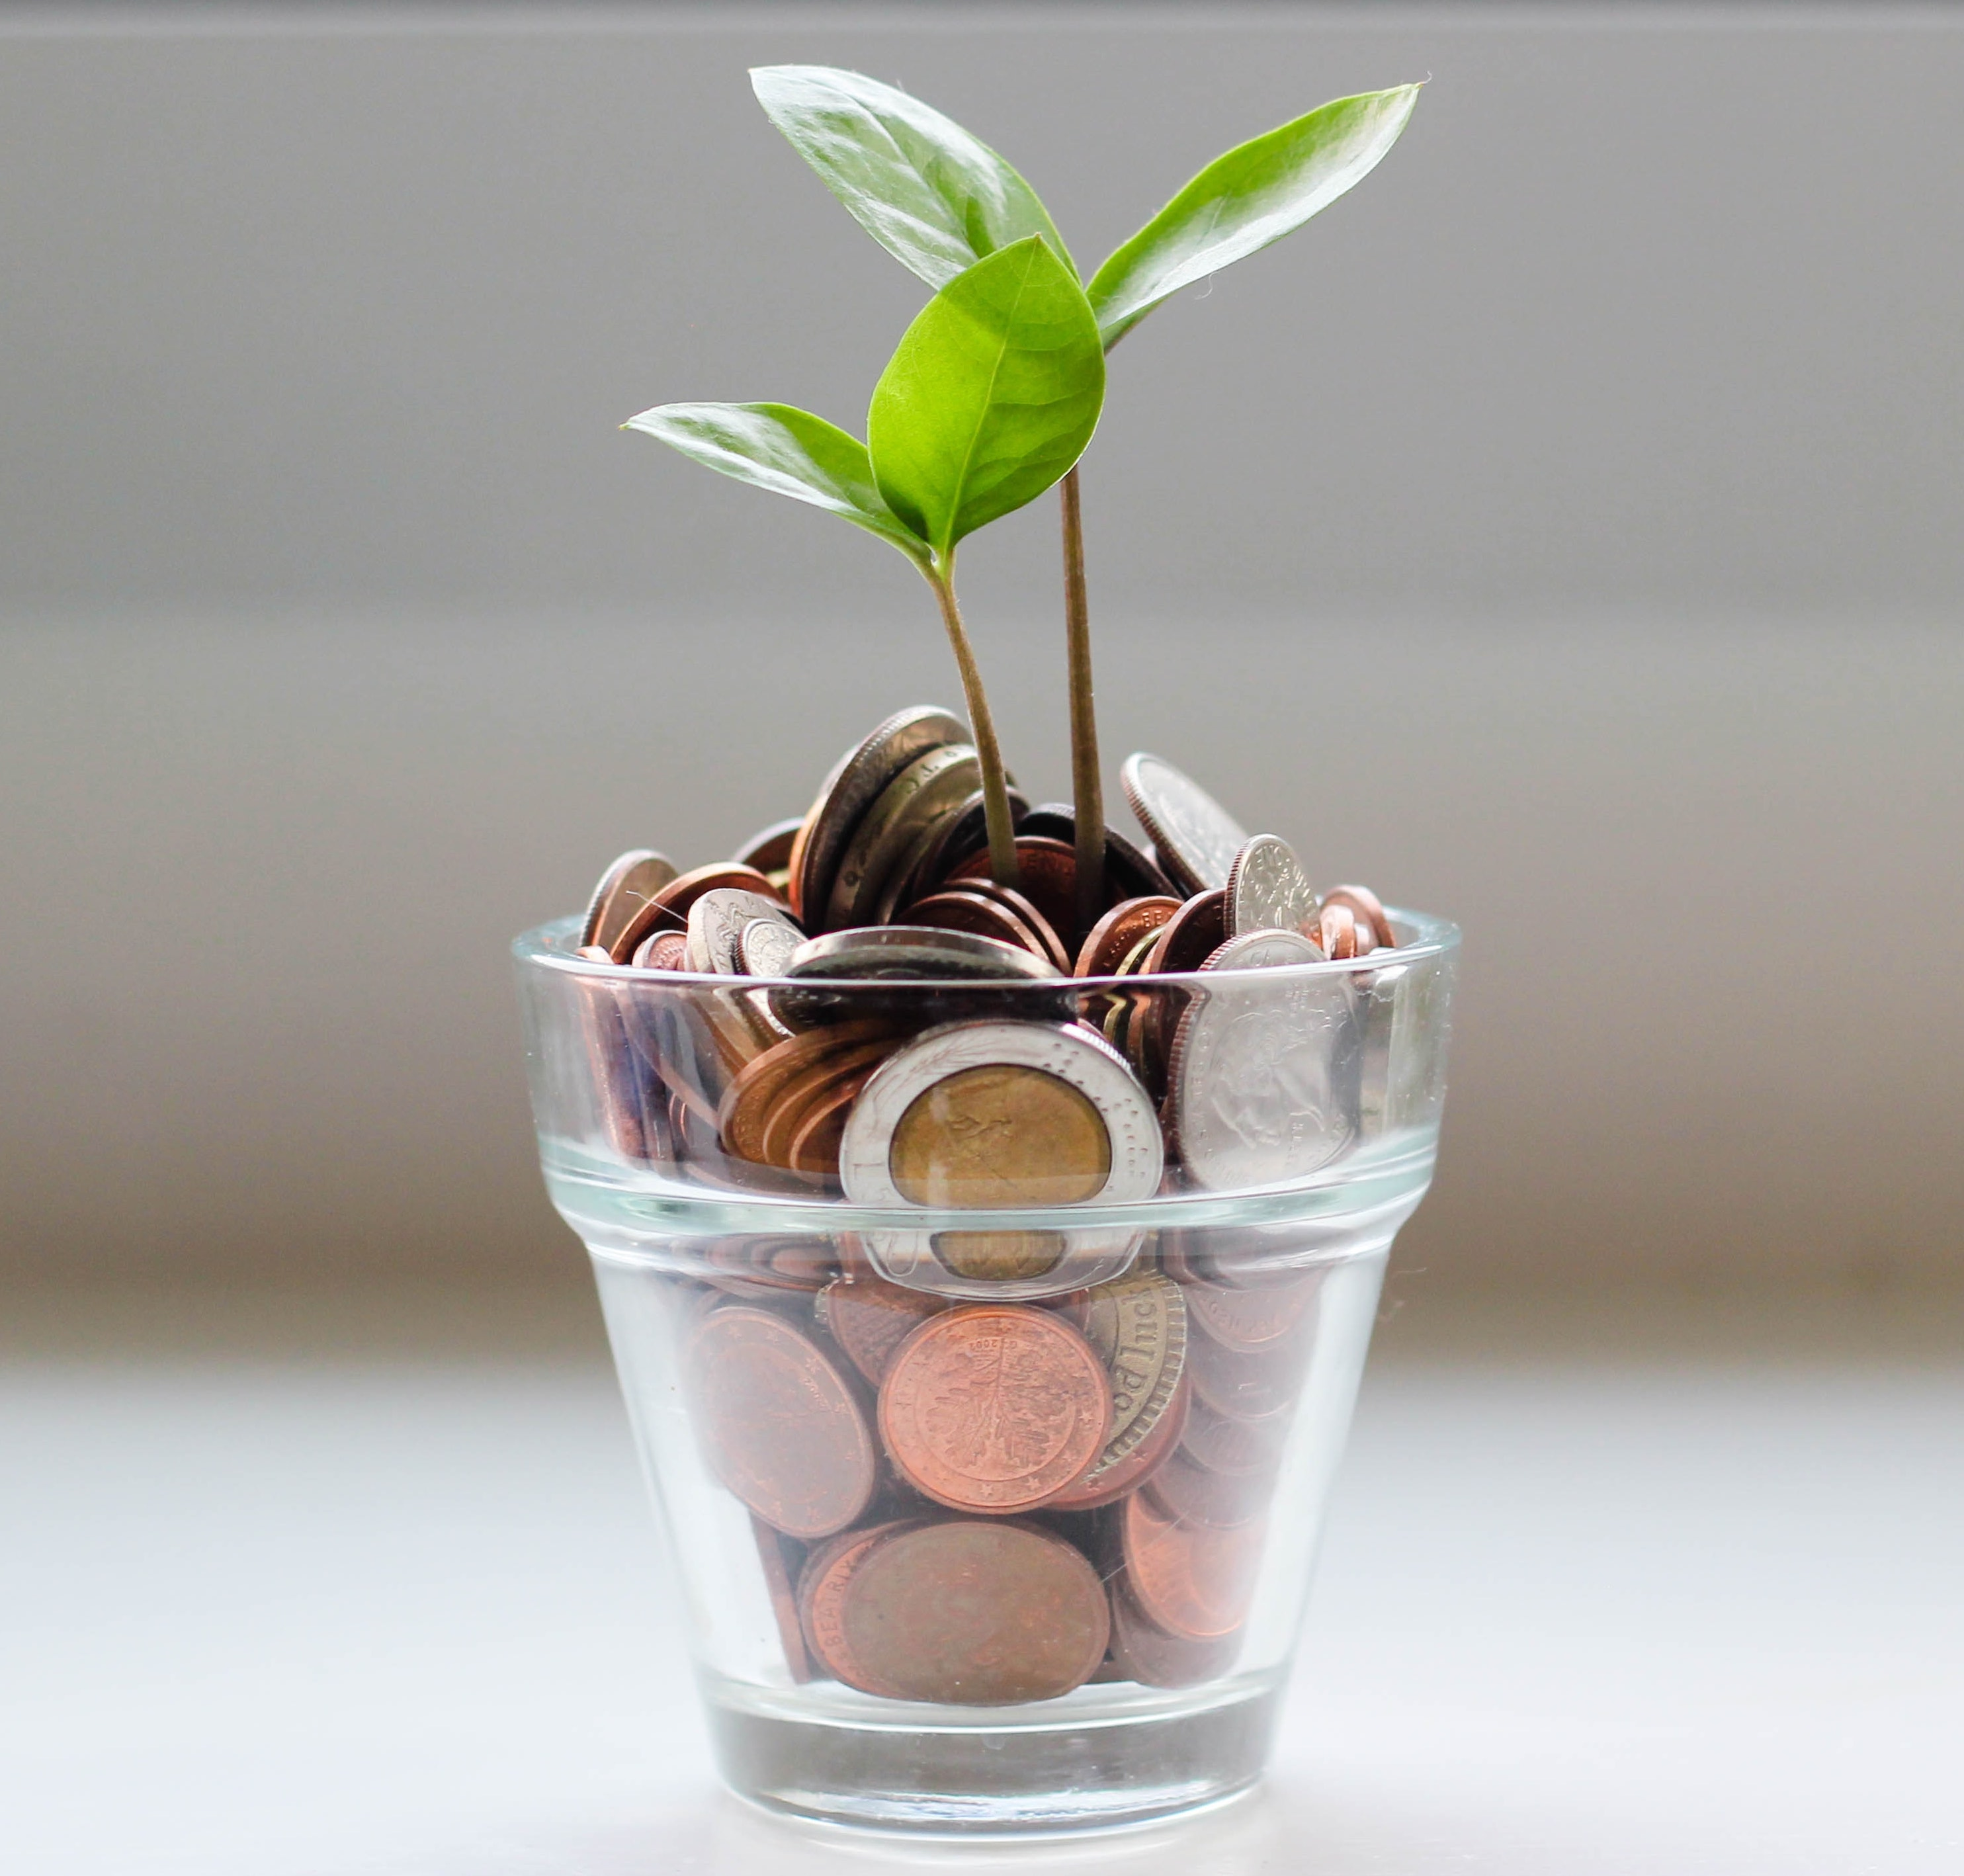 https://www.kimtikt.nl/wp-content/uploads/2020/06/Affilate-marketing-beginnen-1.jpg